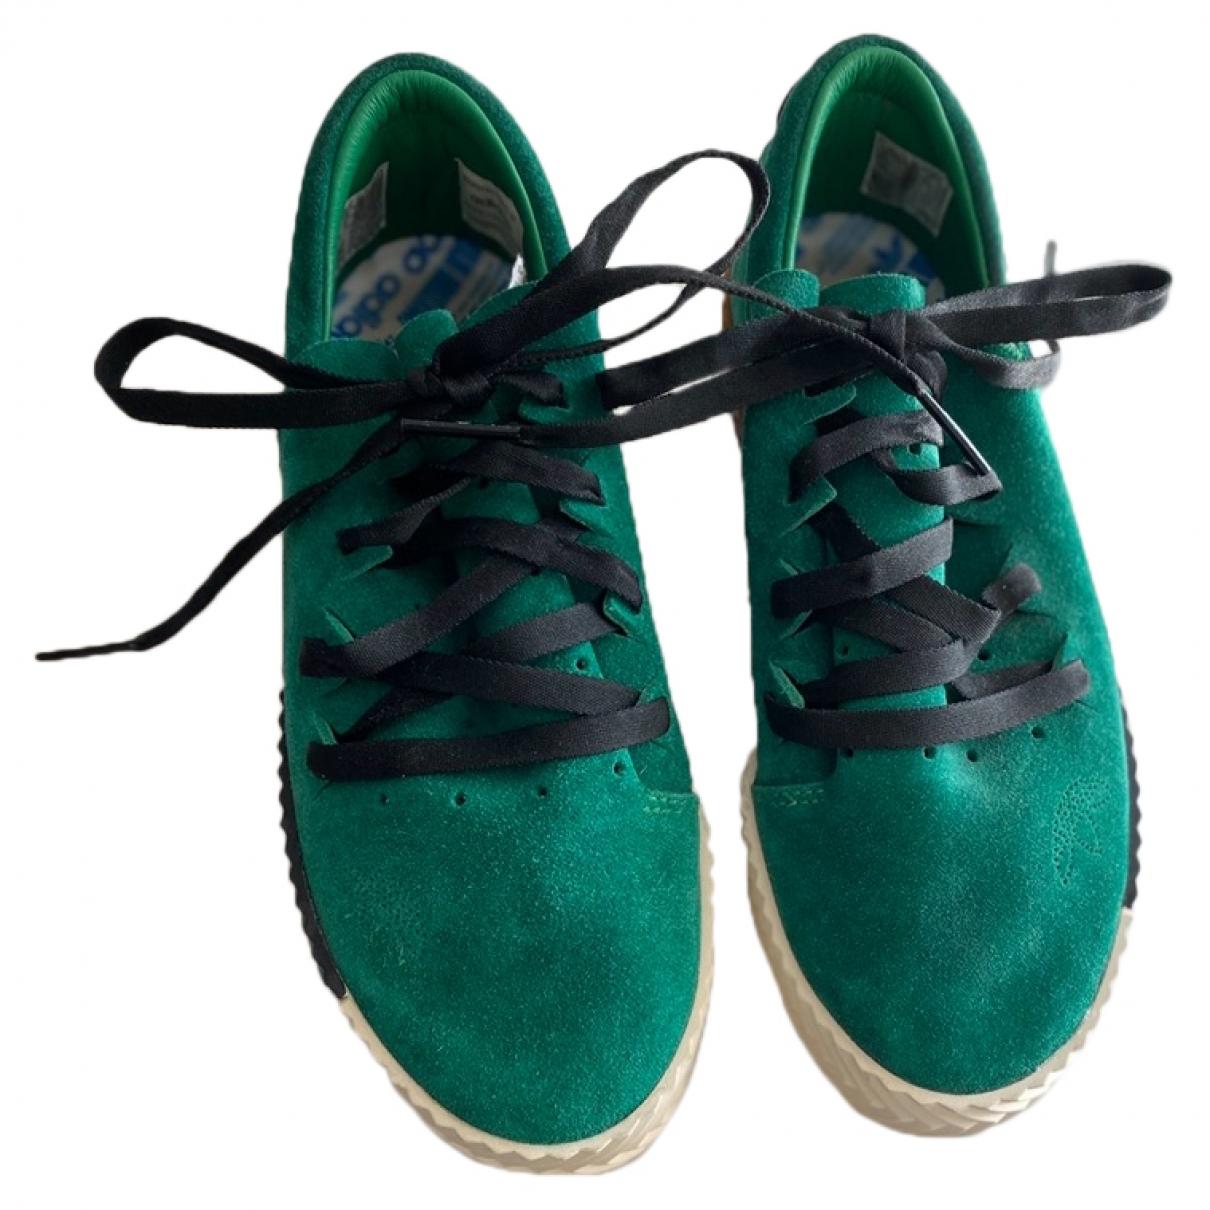 Adidas Originals X Alexander Wang \N Green Leather Trainers for Women 36.5 EU